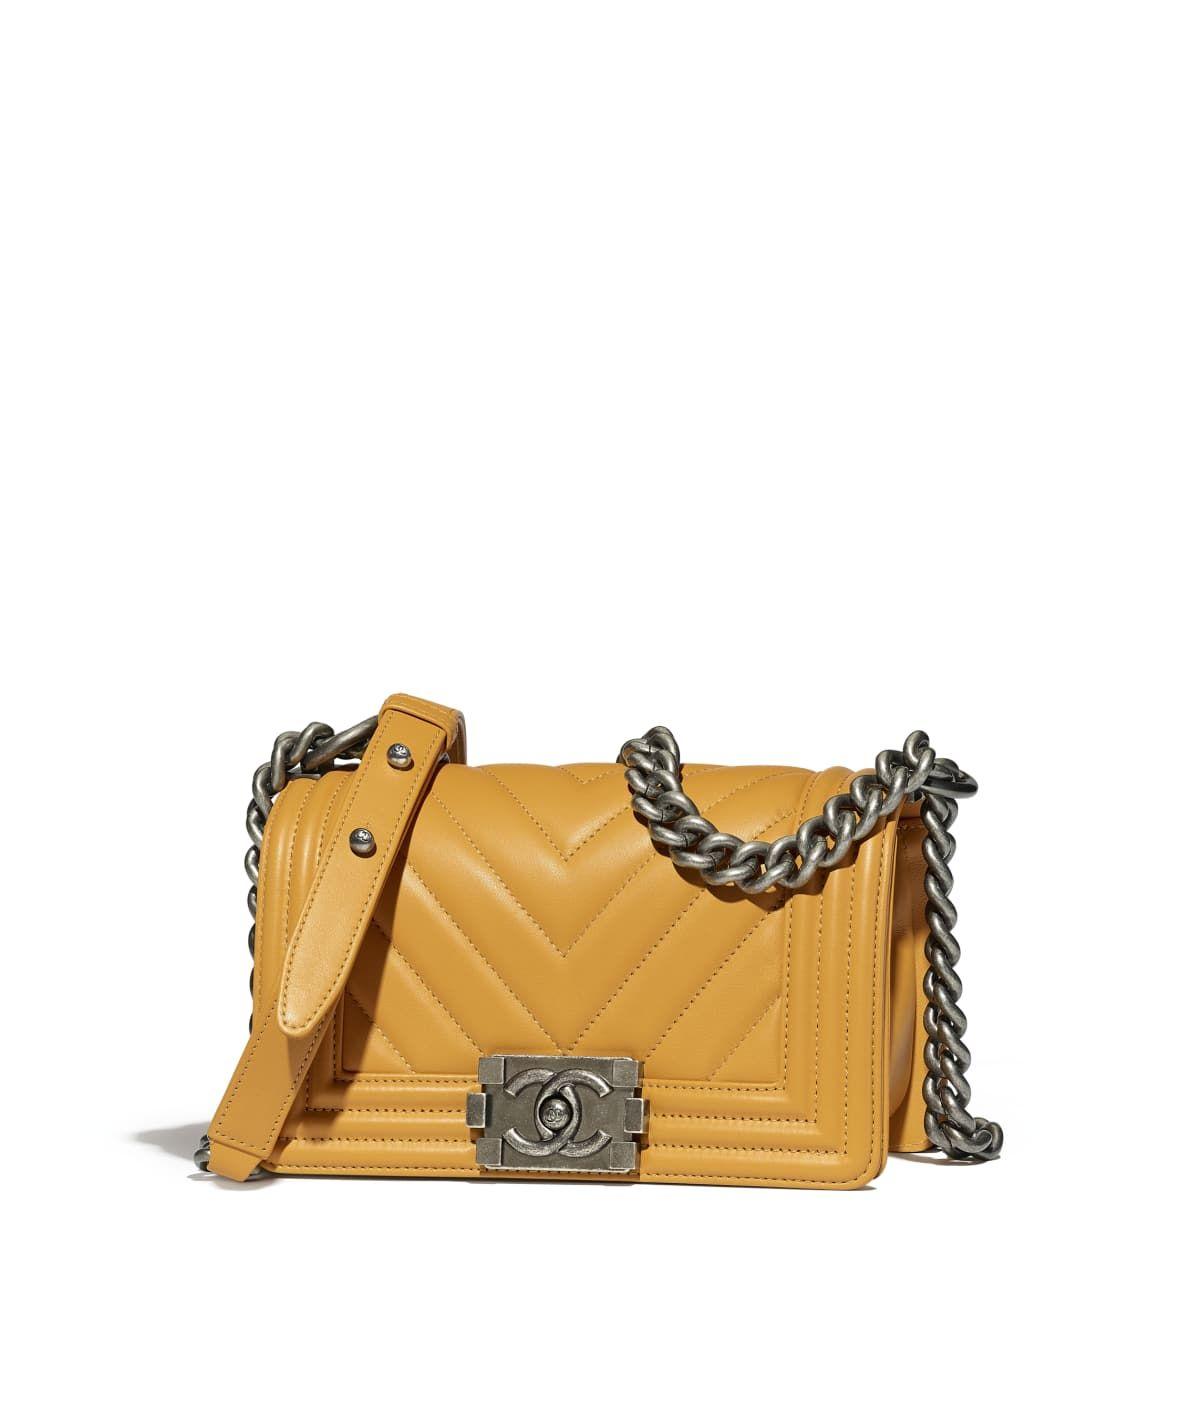 5cdf599ad081ee Handbags of the Métiers d'Art Paris-Hamburg 2017/18 CHANEL Fashion  collection : Small BOY CHANEL Handbag, calfskin & ruthenium-finish metal,  yellow on the ...